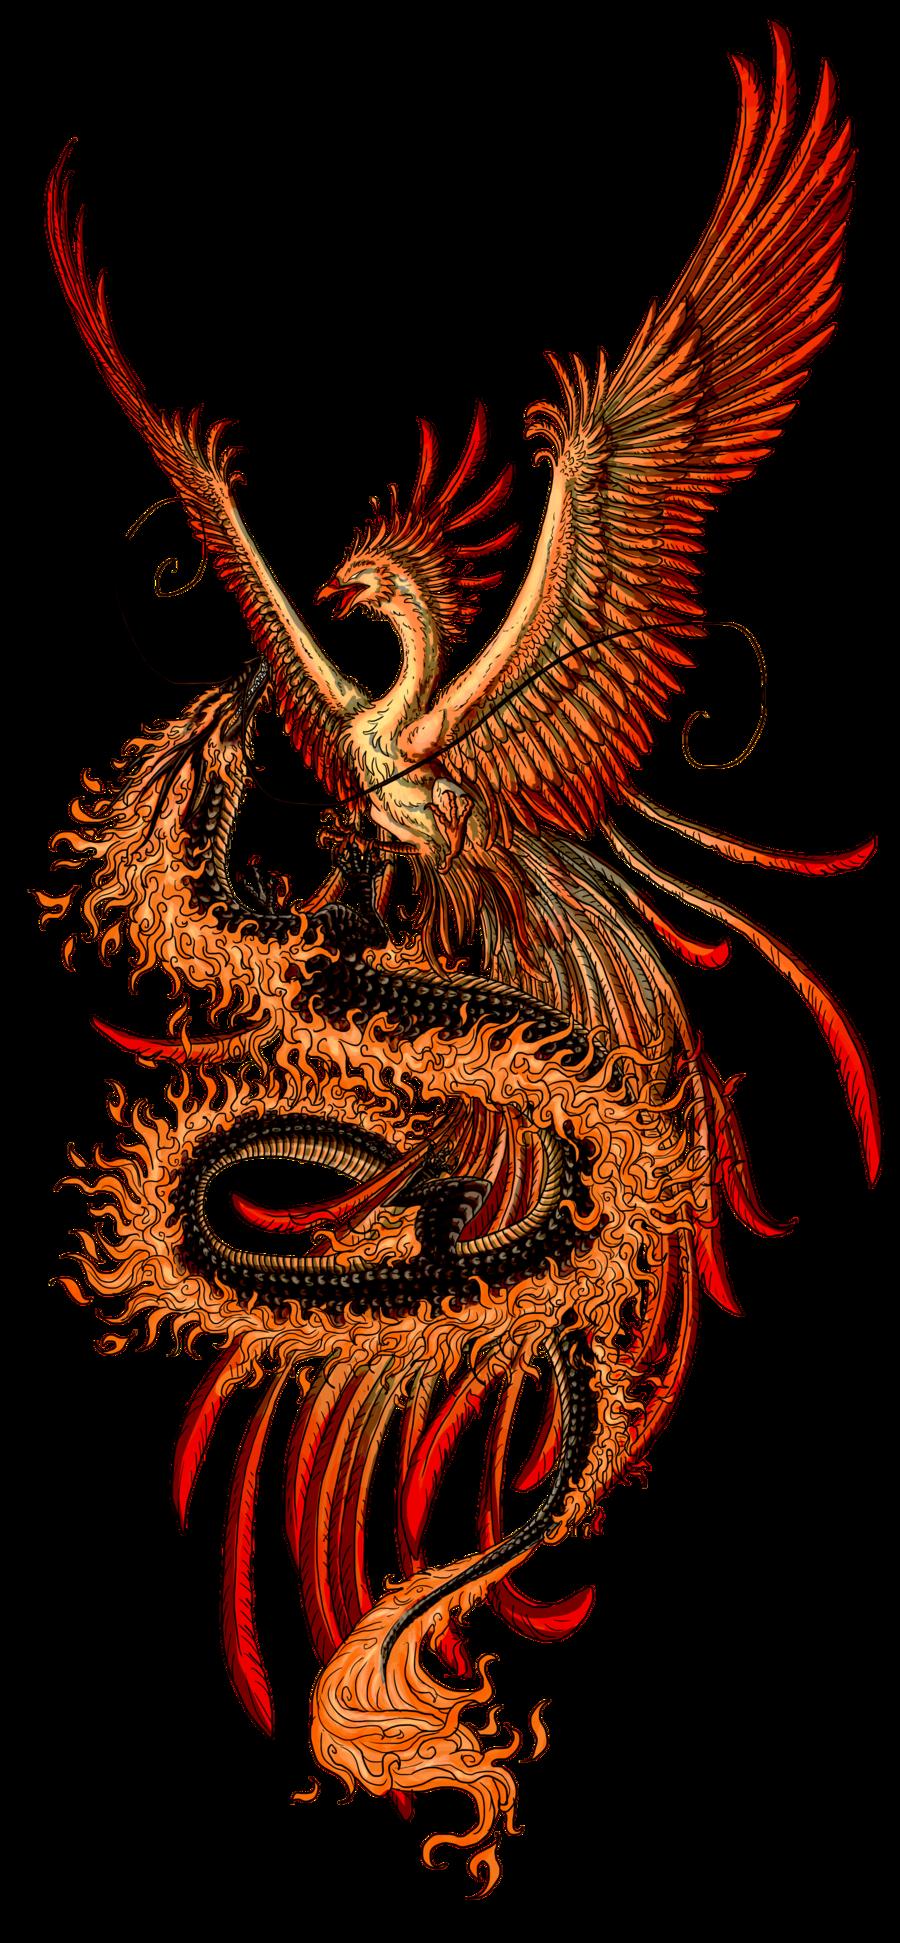 Sun phoenix clipart clipart Phoenix Tattoos PNG Transparent Phoenix Tattoos.PNG Images. | PlusPNG clipart